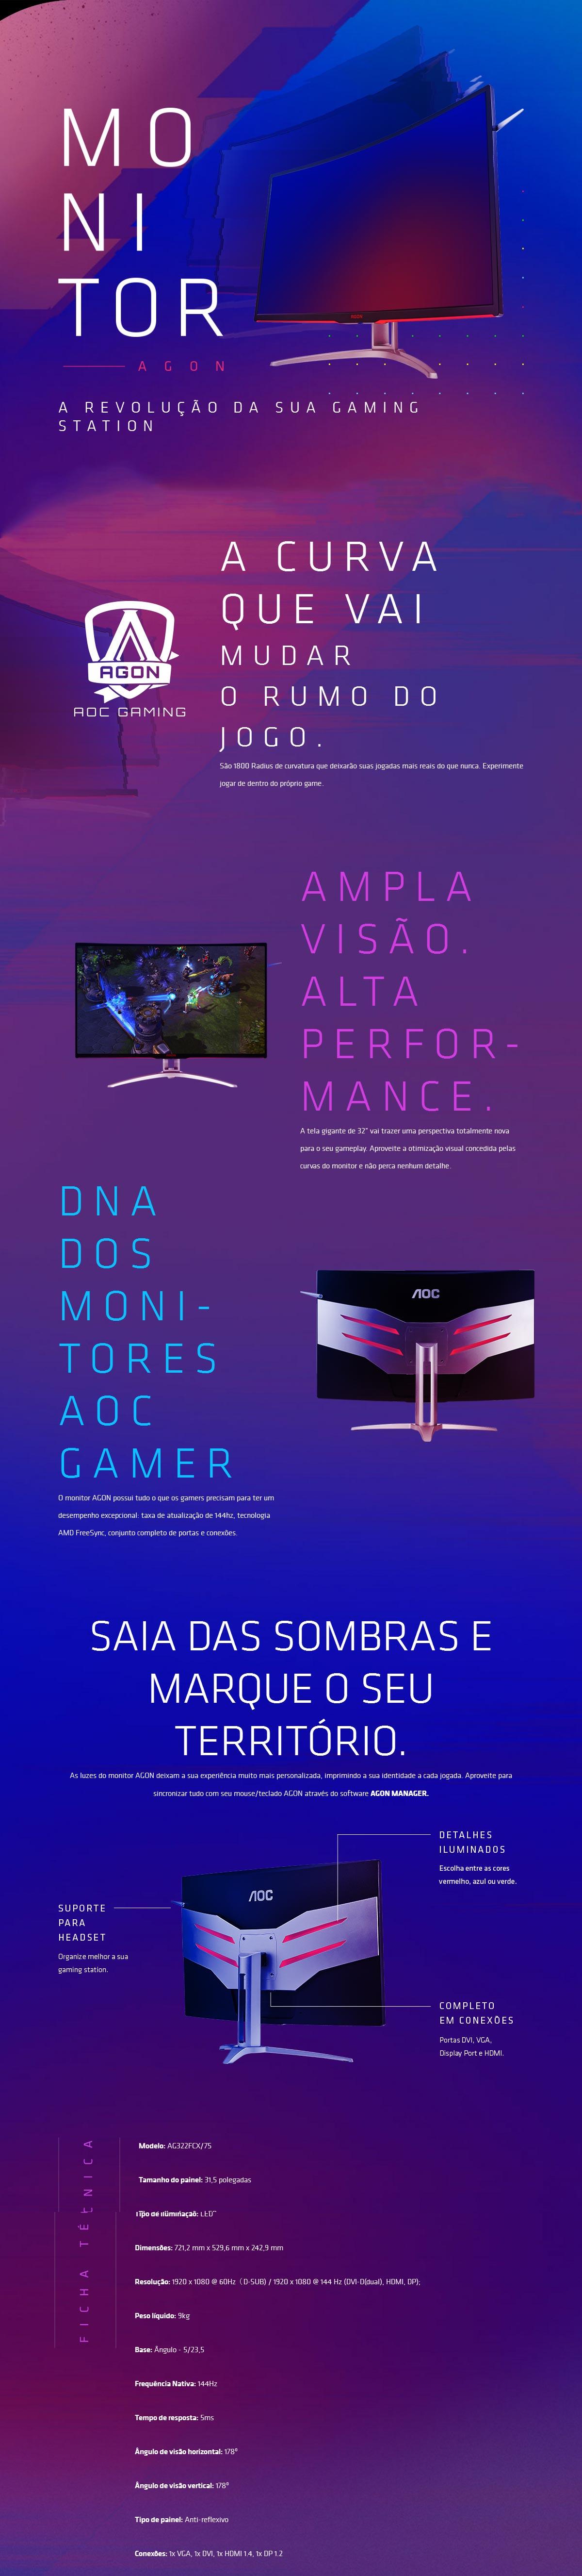 Recursos do Monitor Gamer LED 31,5pol AOC Agon 144Hz 5ms Tela Curva Full HD